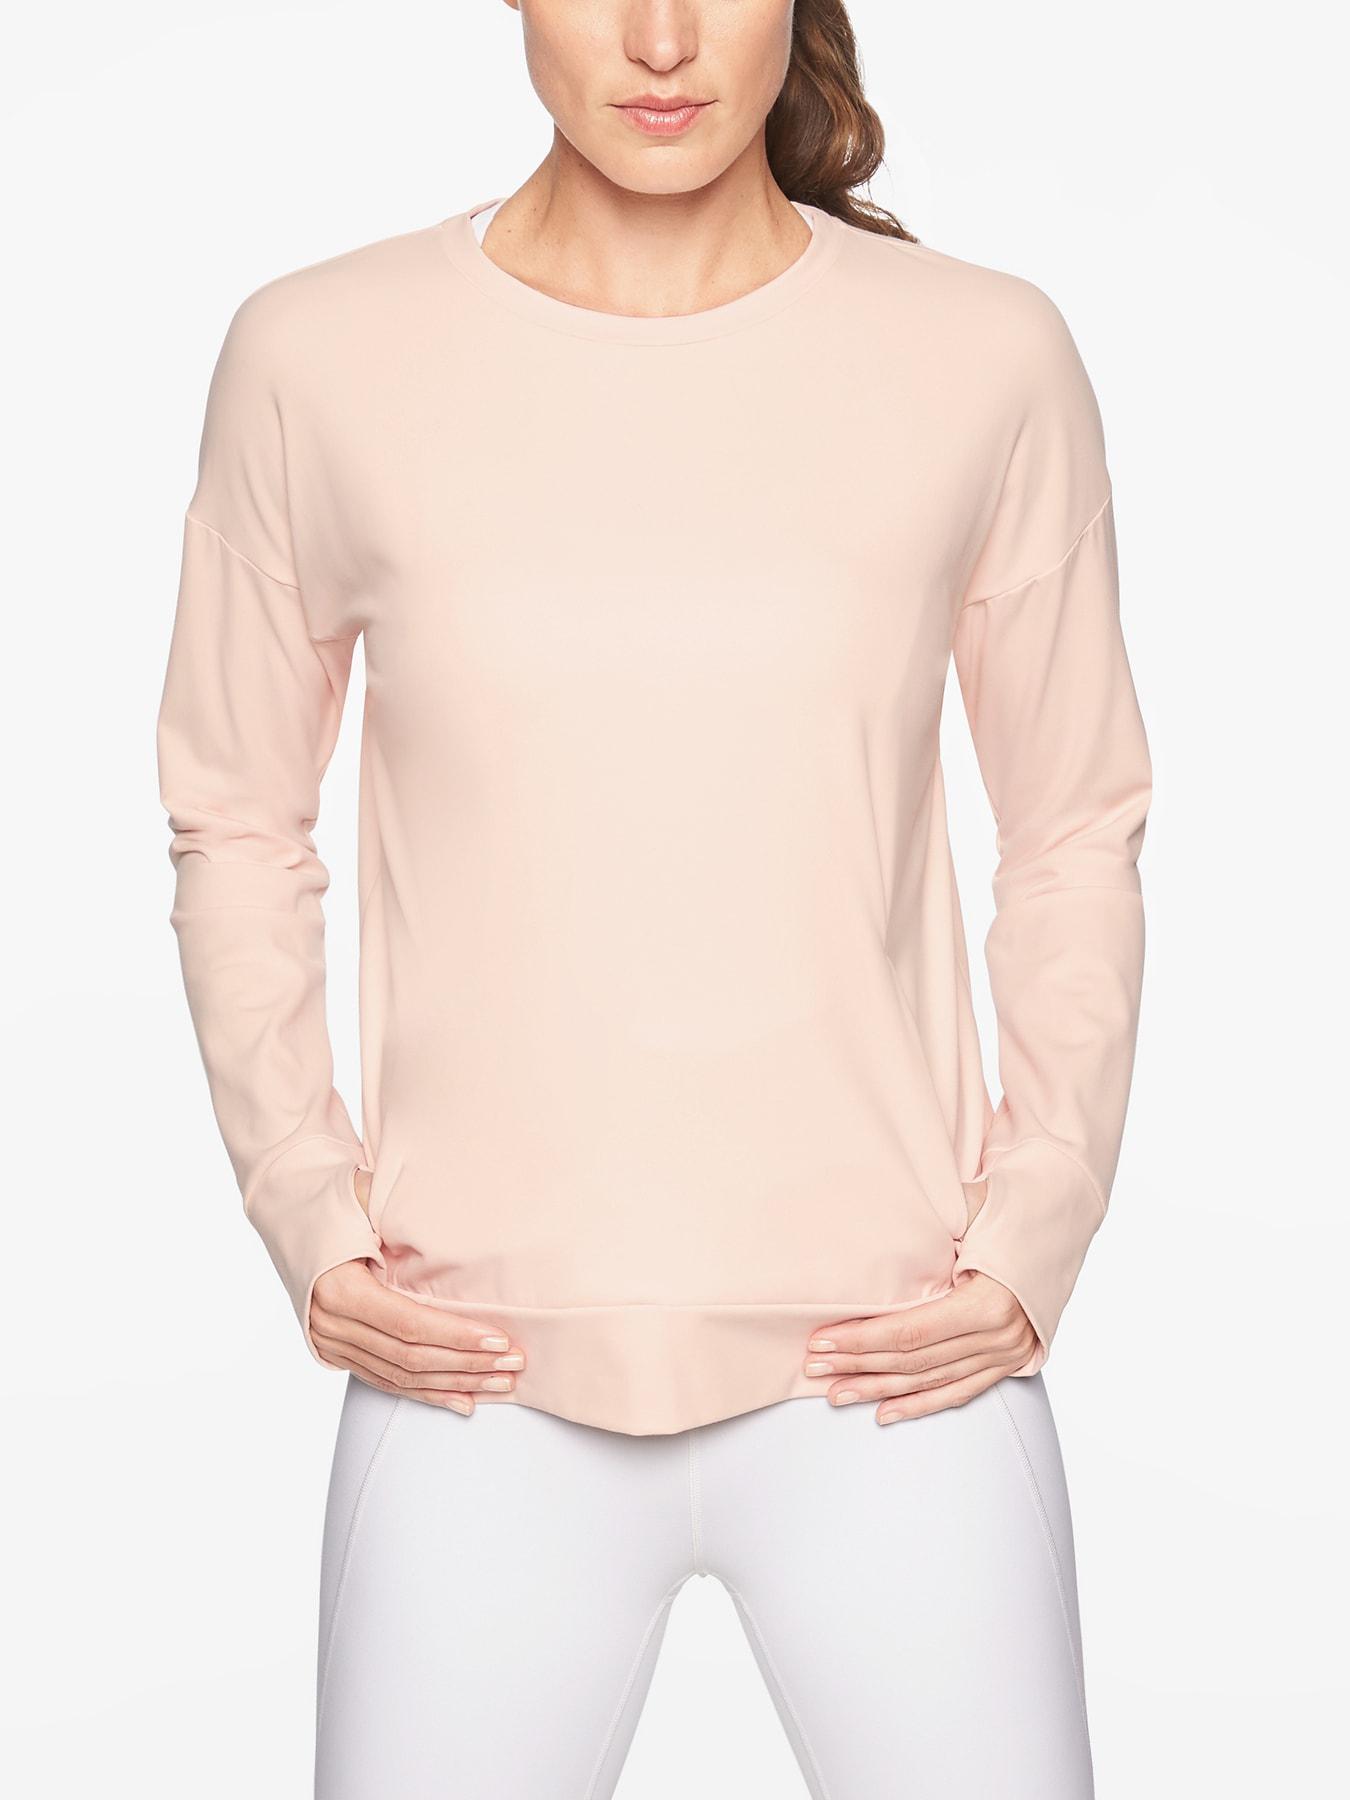 cf3f980548 Athleta Inversion Sweatshirt in Pink - Lyst